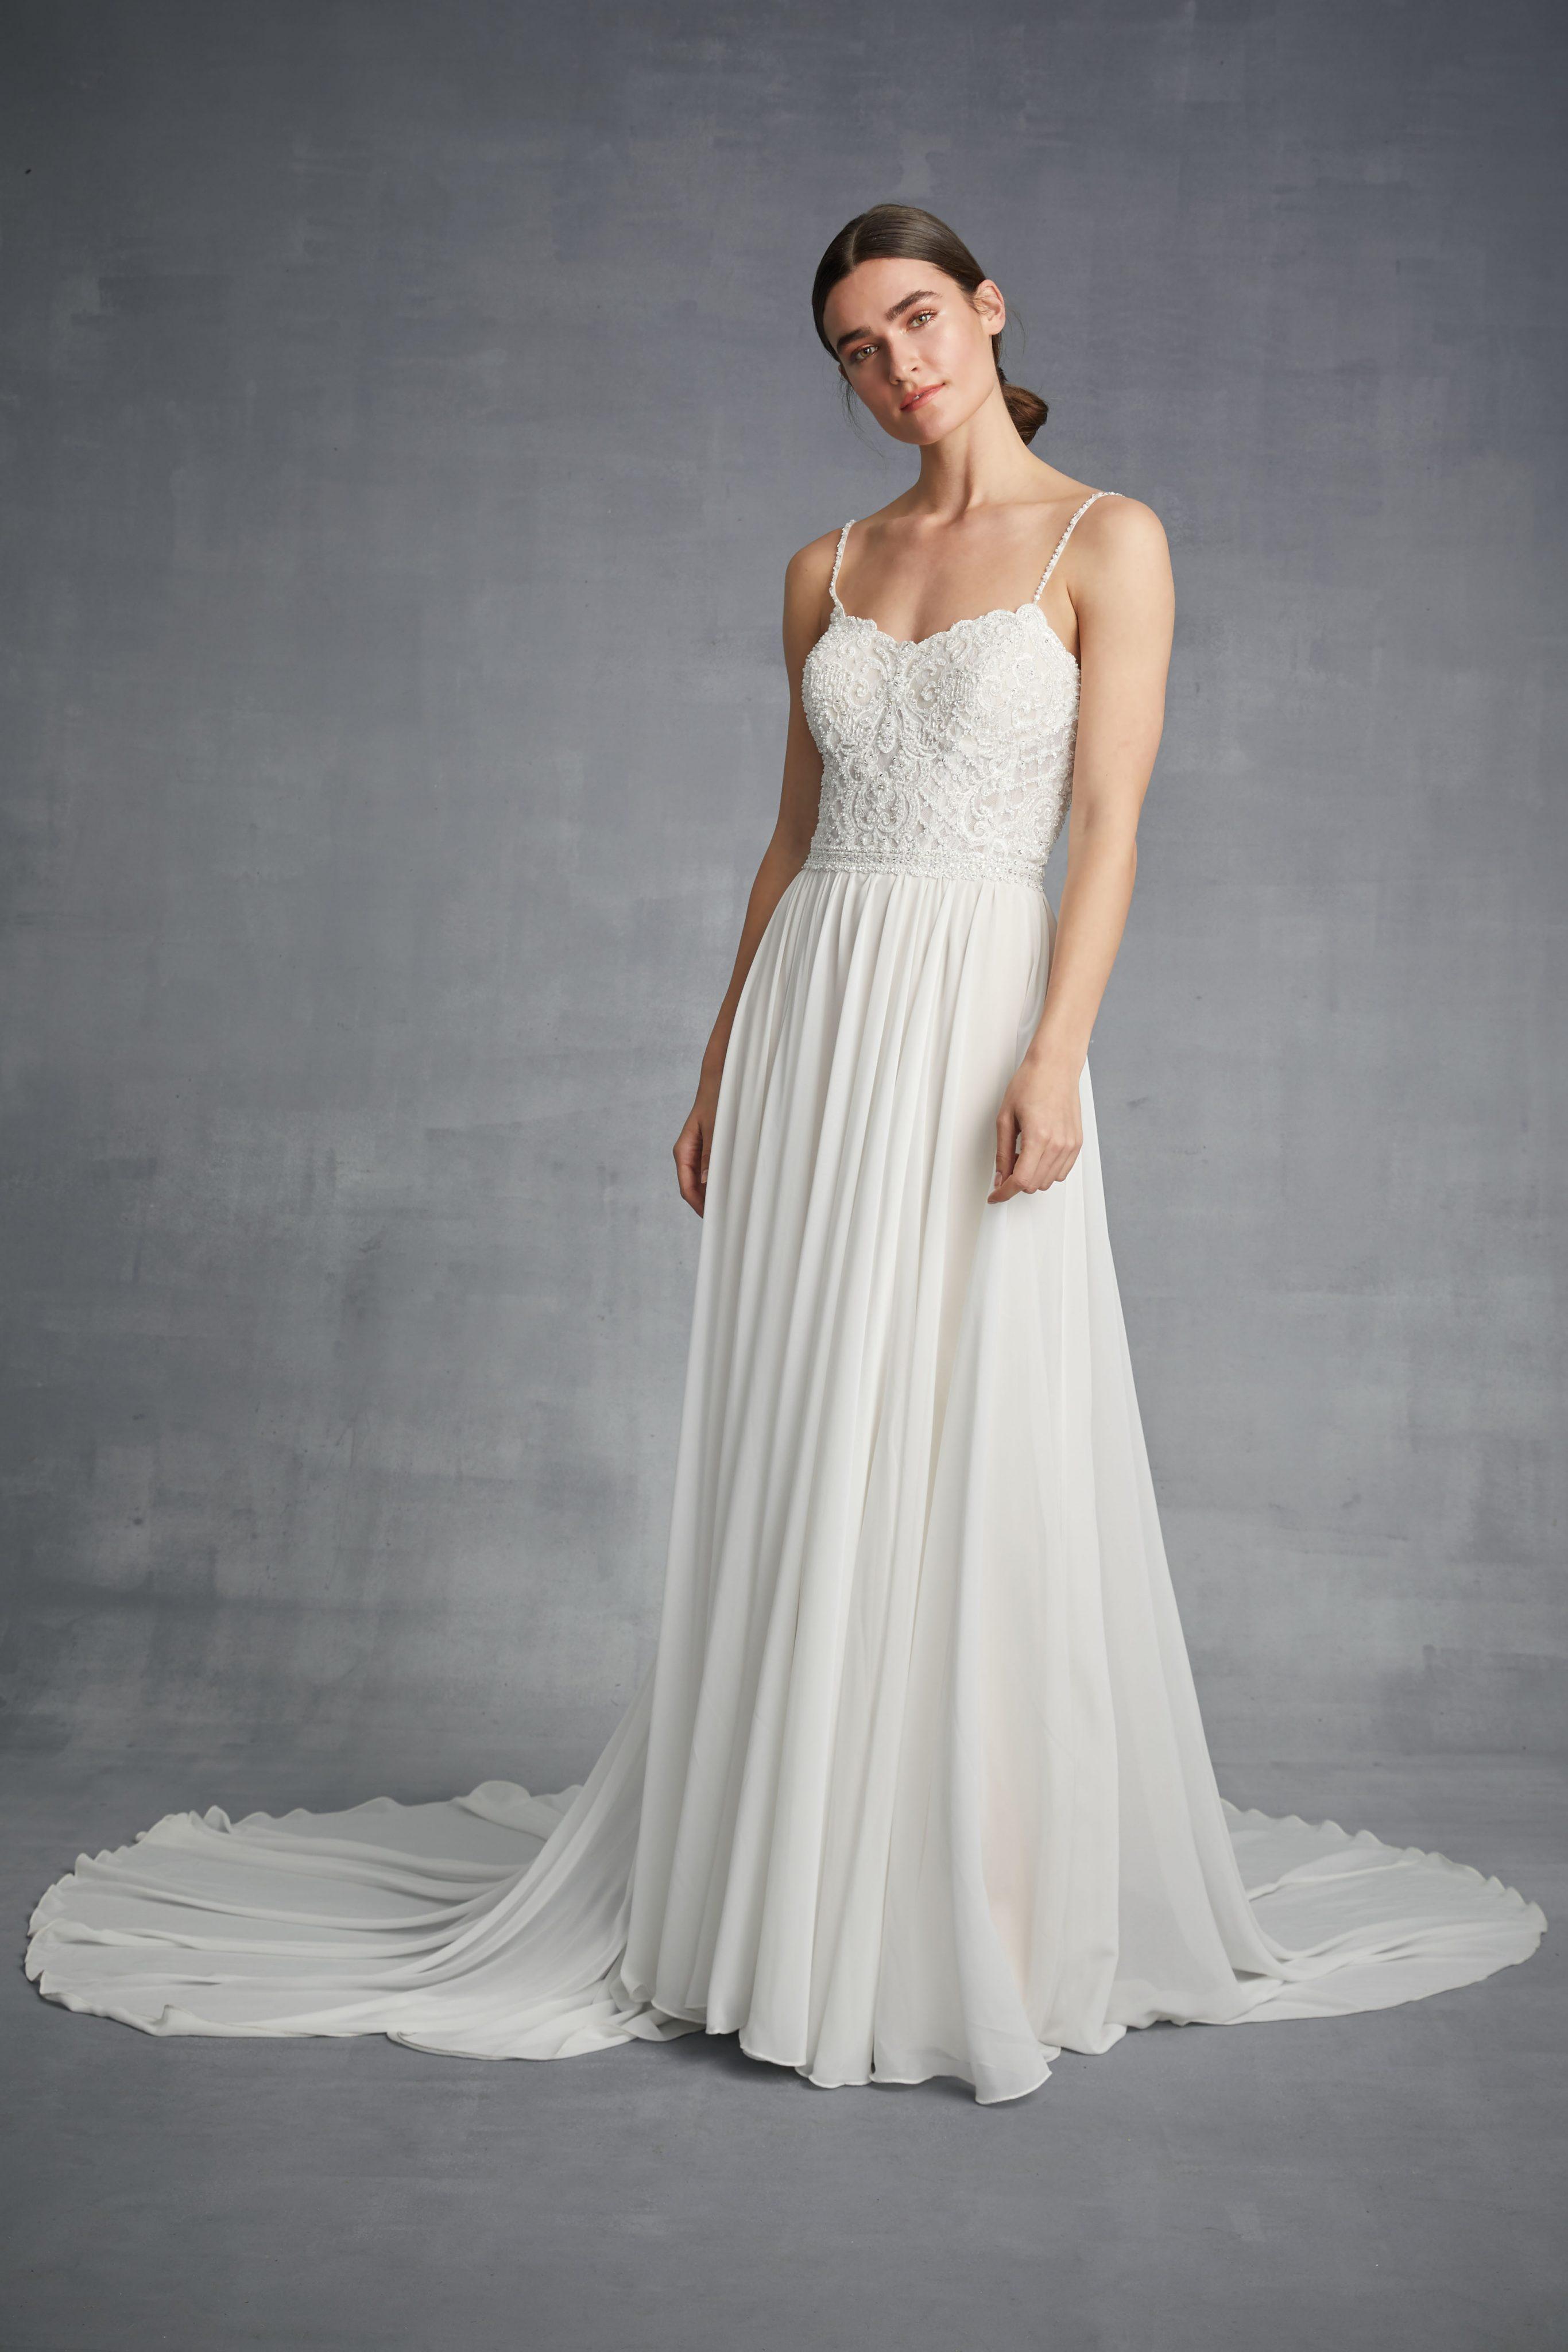 b2c6d1e1d Spaghetti Strap Sheath Chiffon Wedding Dress | Kleinfeld Bridal. Charming  Spaghetti Straps Backless Sheath V-Neck Satin Chiffon Wedding ...